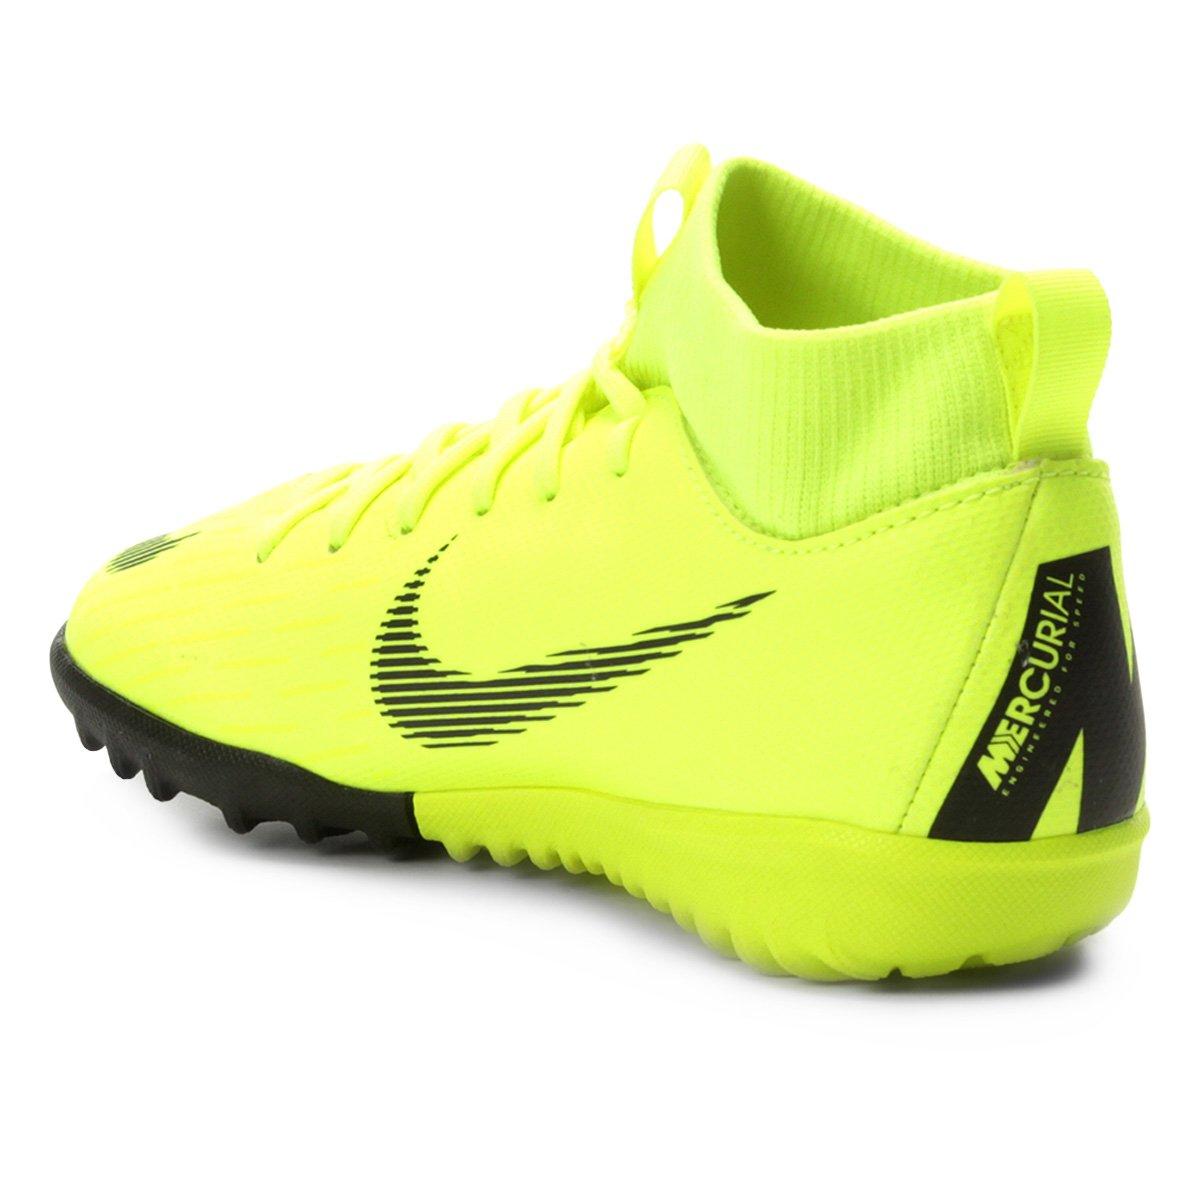 ... Chuteira Society Infantil Nike Mercurial Superfly 6 Academy GS TF ... c2ca3890bee93